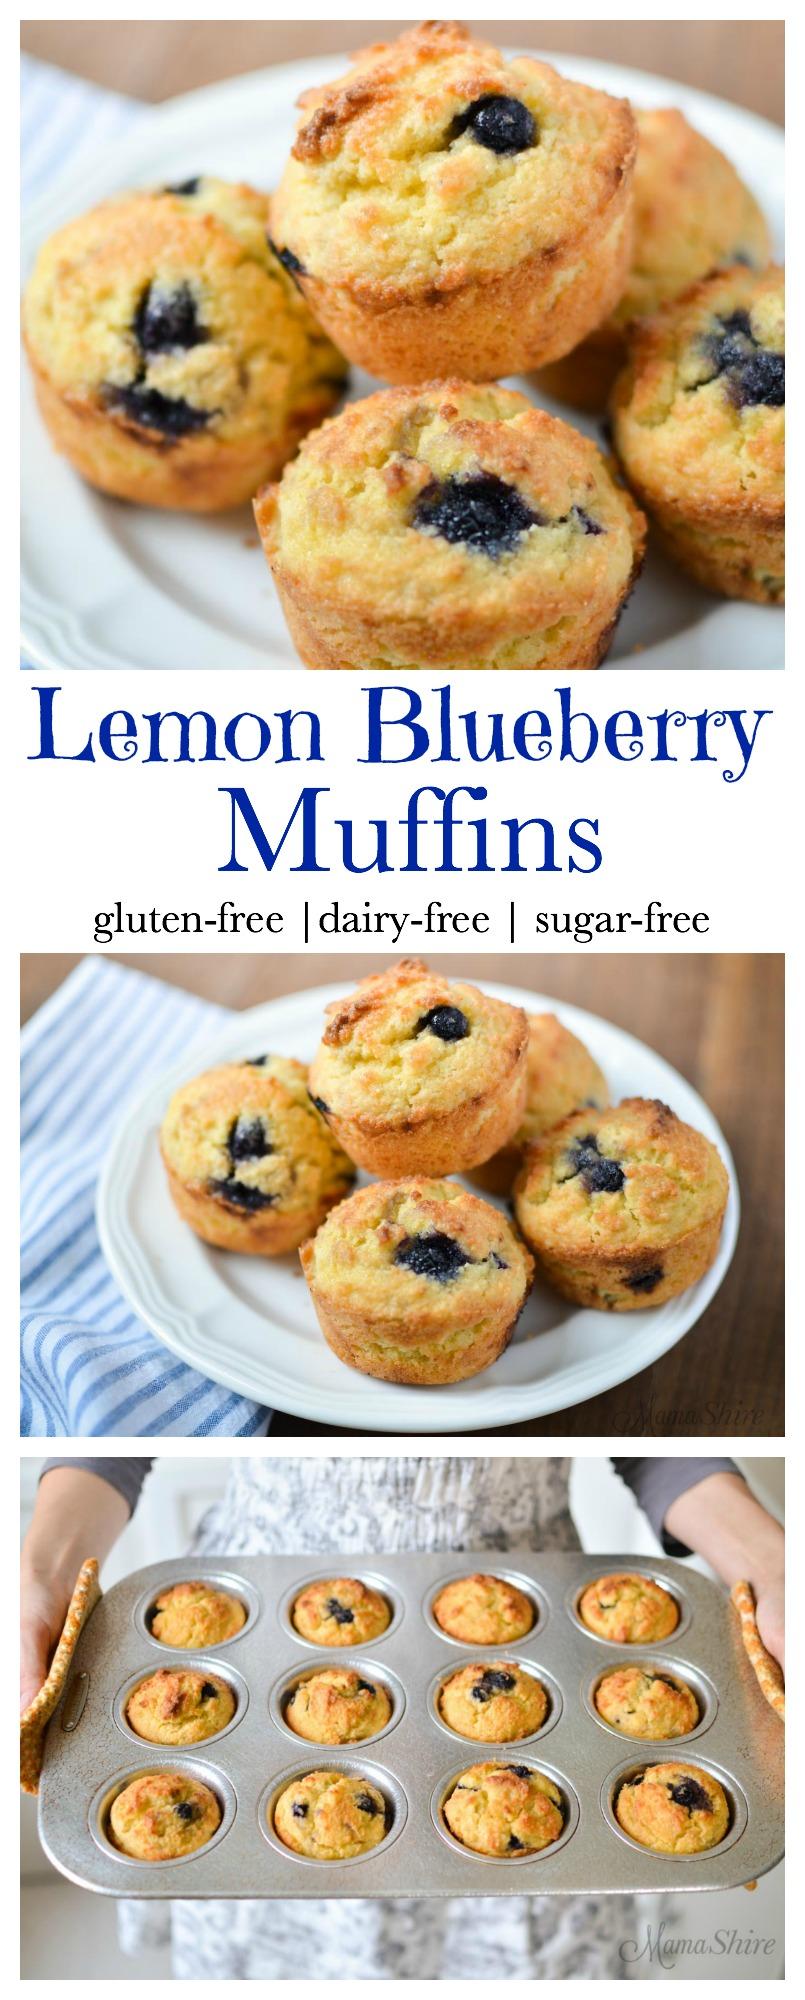 Lemon Blueberry Muffins - Gluten-free, Dairy-free, Sugar-free